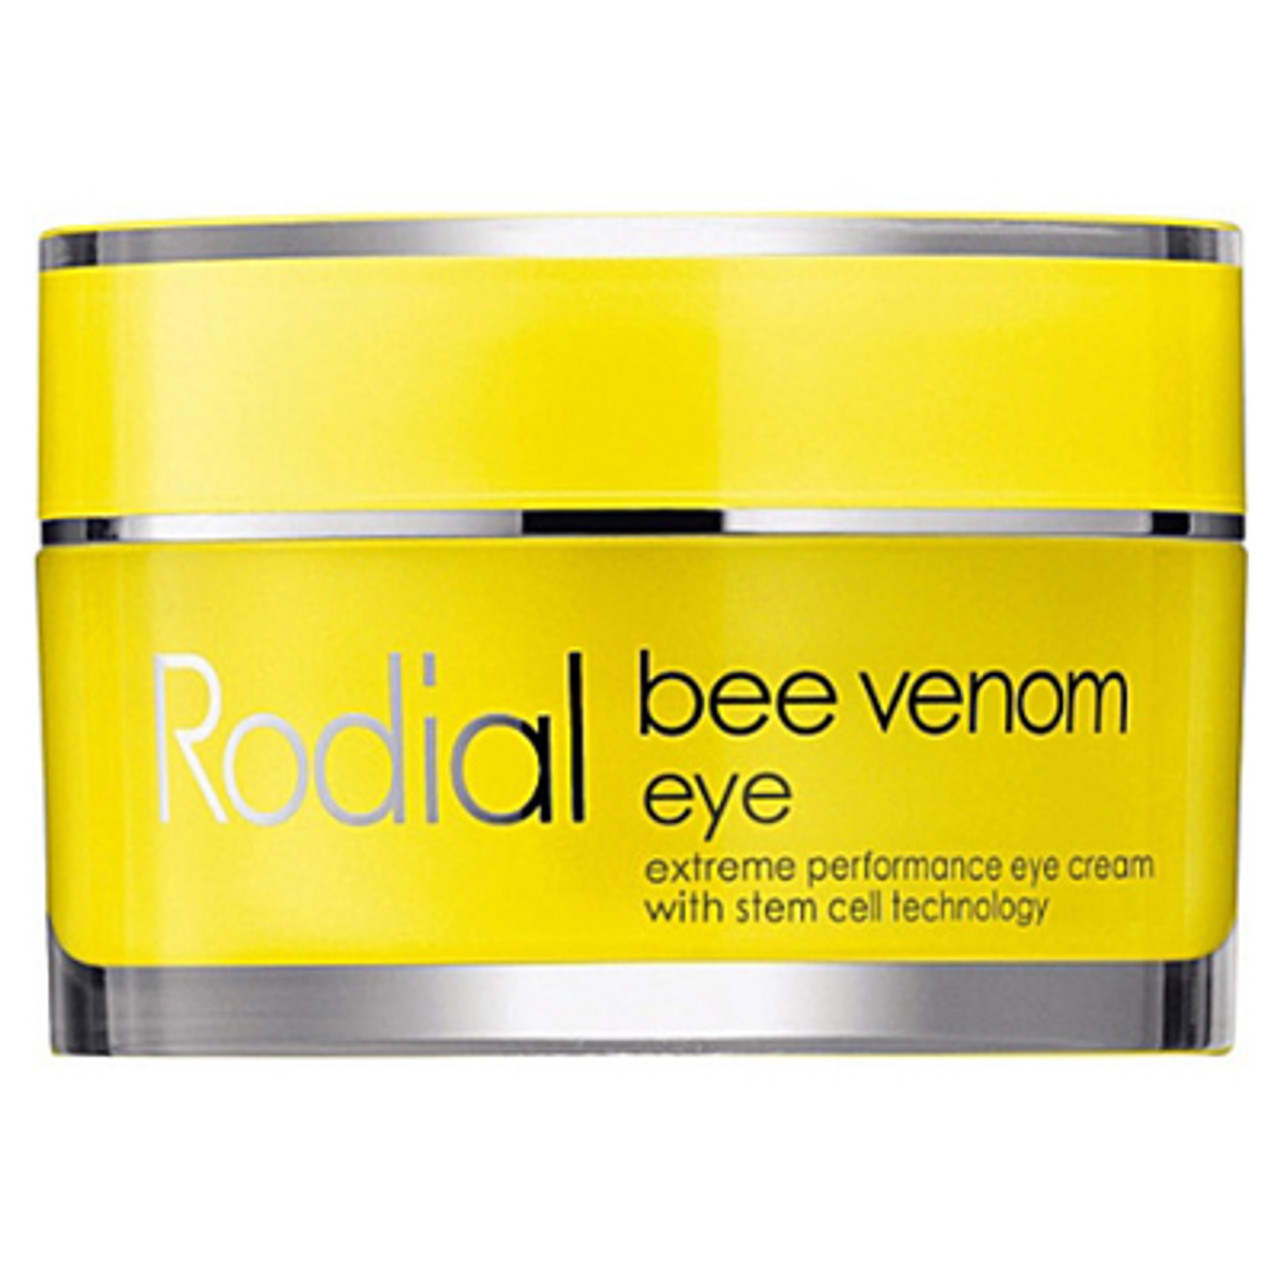 Rodial Bee Venom Eye BeautifiedYou.com